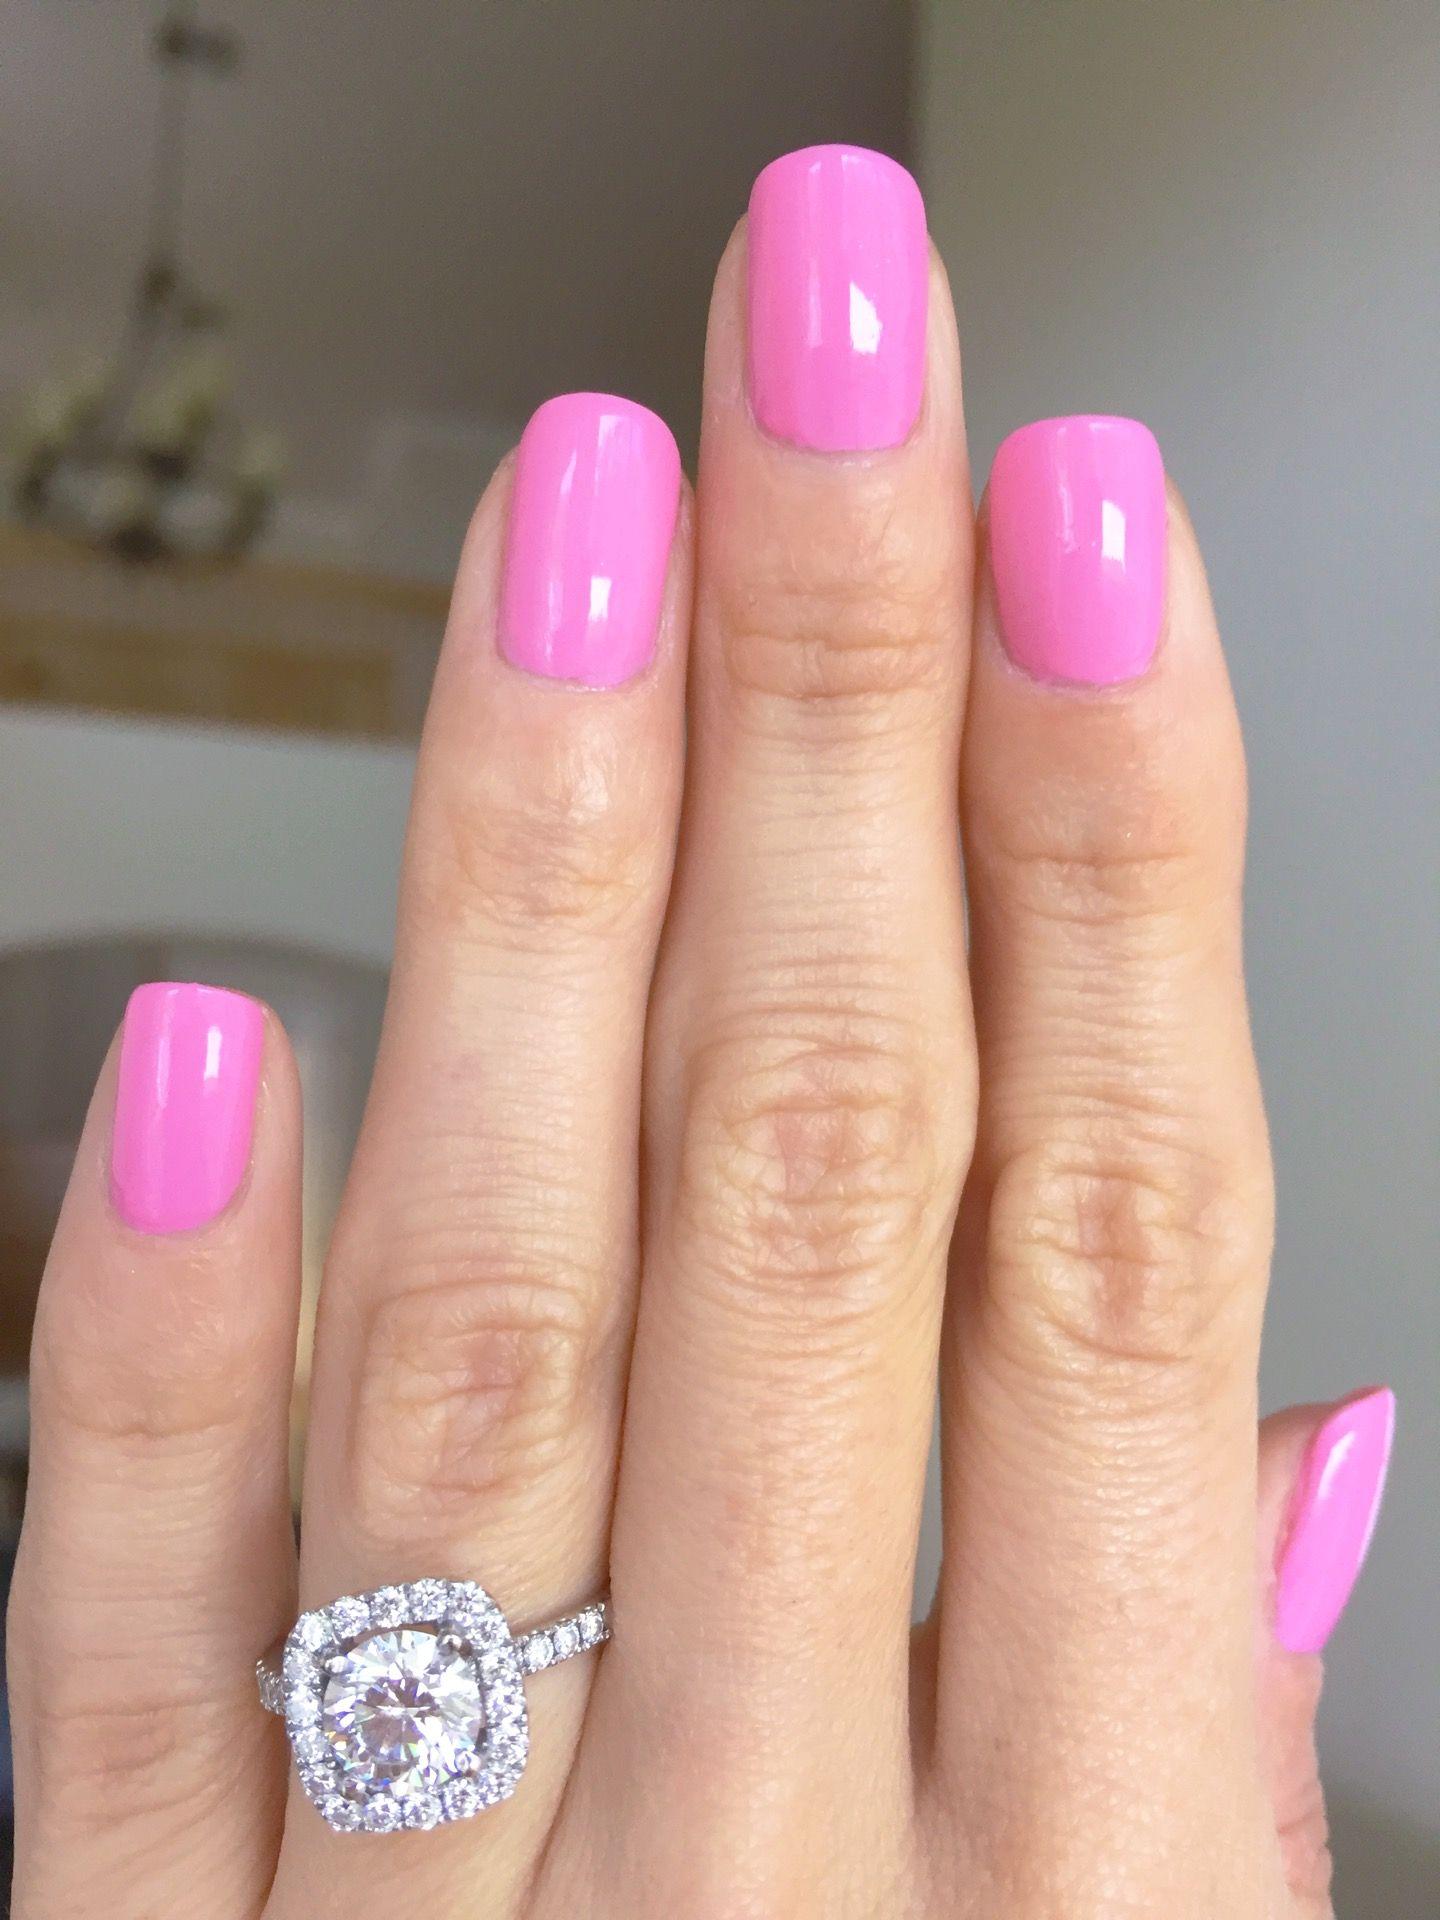 Essie Gel Couture - Haute to Trot manicure - bubblegum pink nails ...